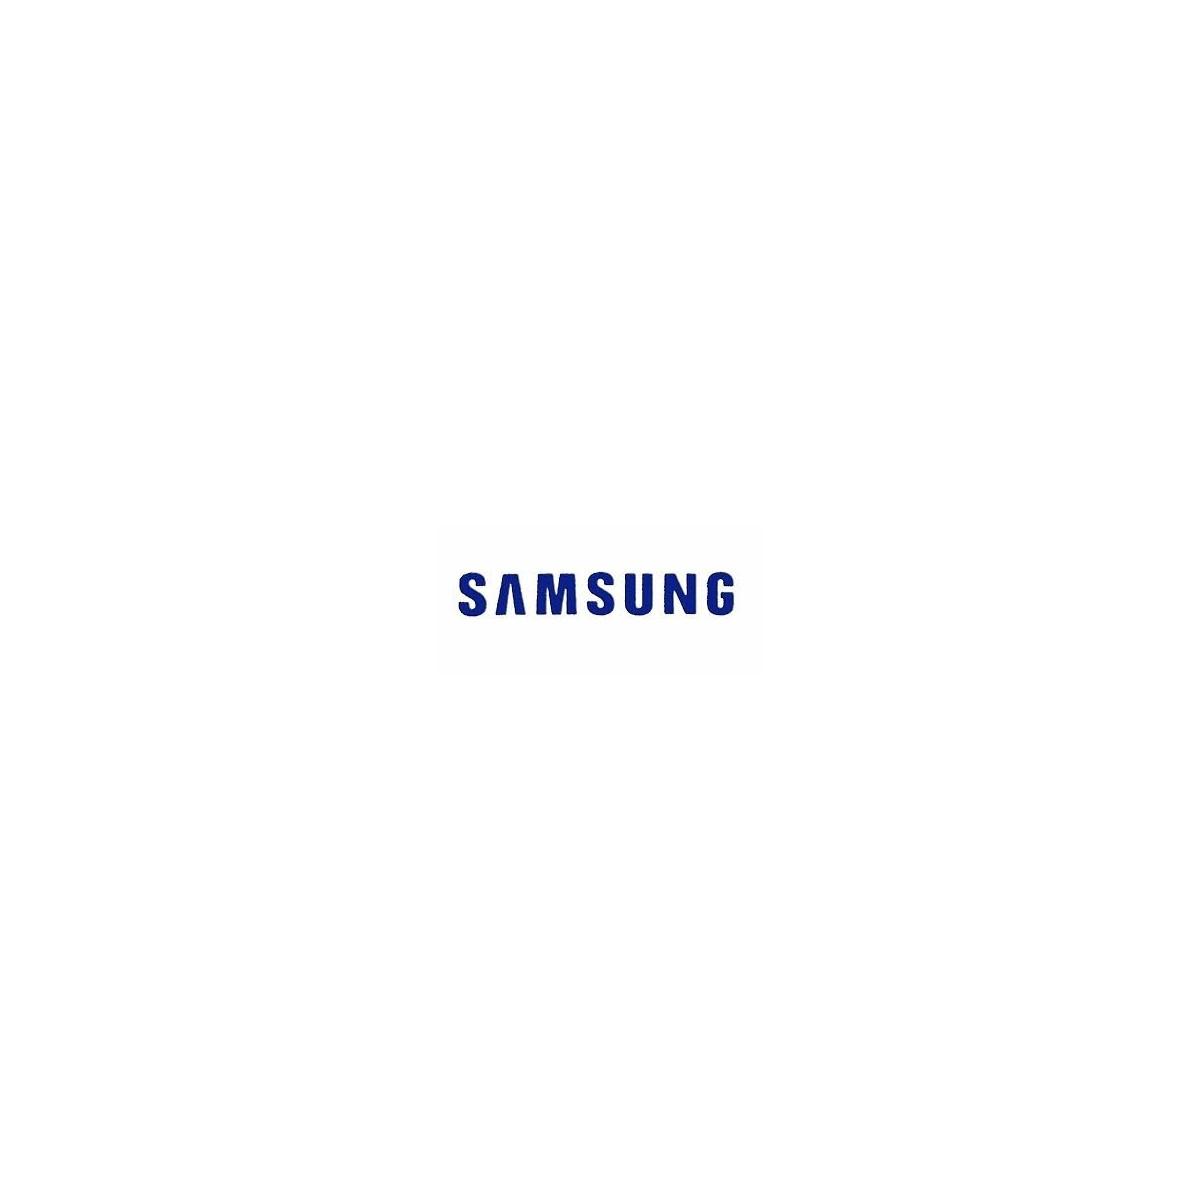 Samsung Scheda CRM